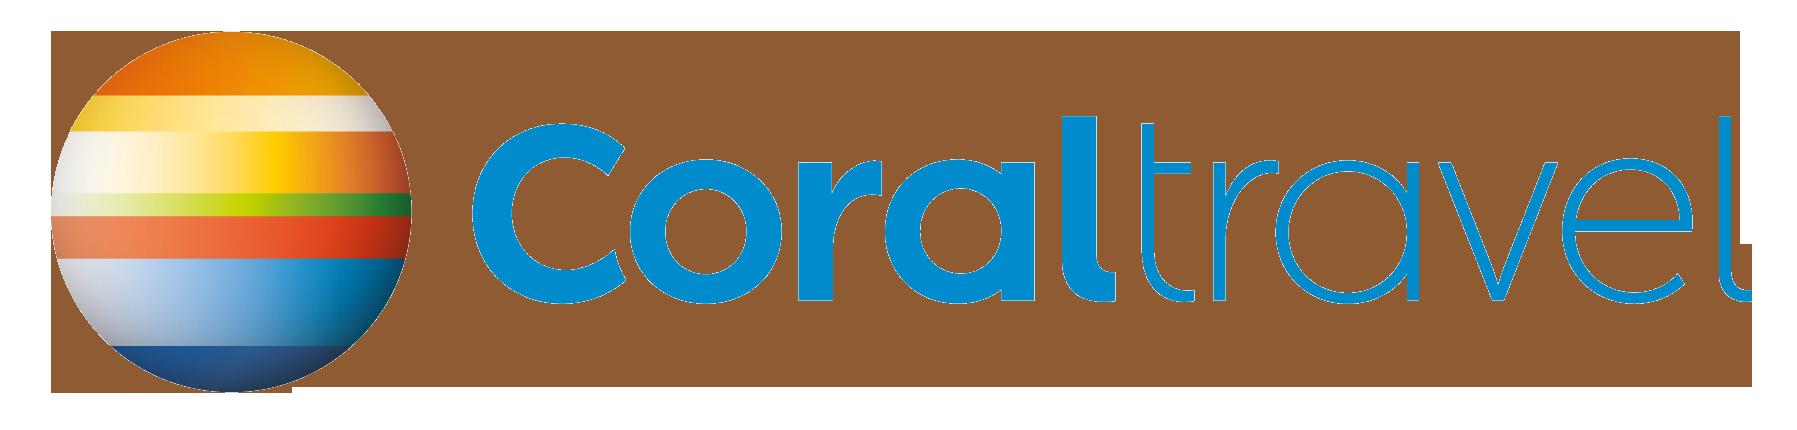 Coral Travel Logos Download